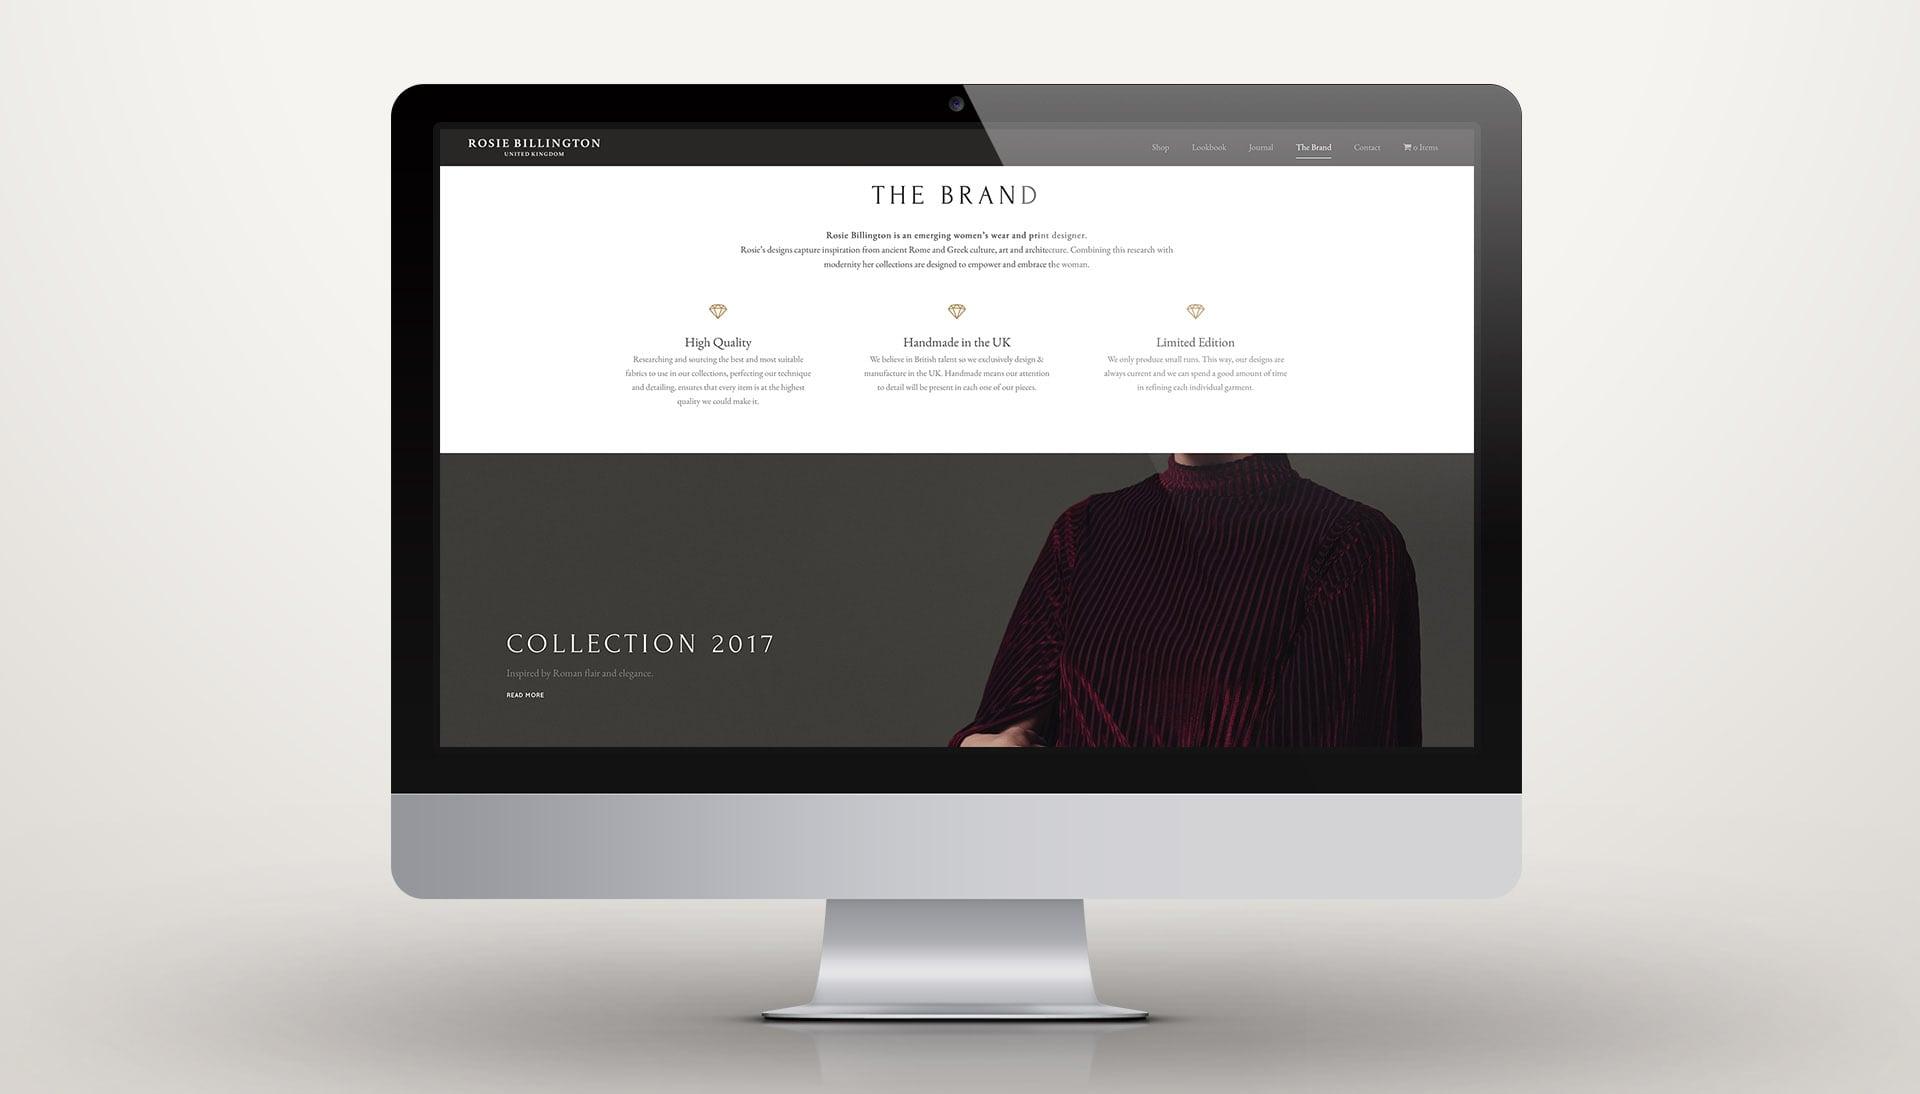 saint loupe, digital agency birmingham, creative studio uk, content production, web agency, marketing agency birmingham, business card design and printing, web development birmingham, bespoke website